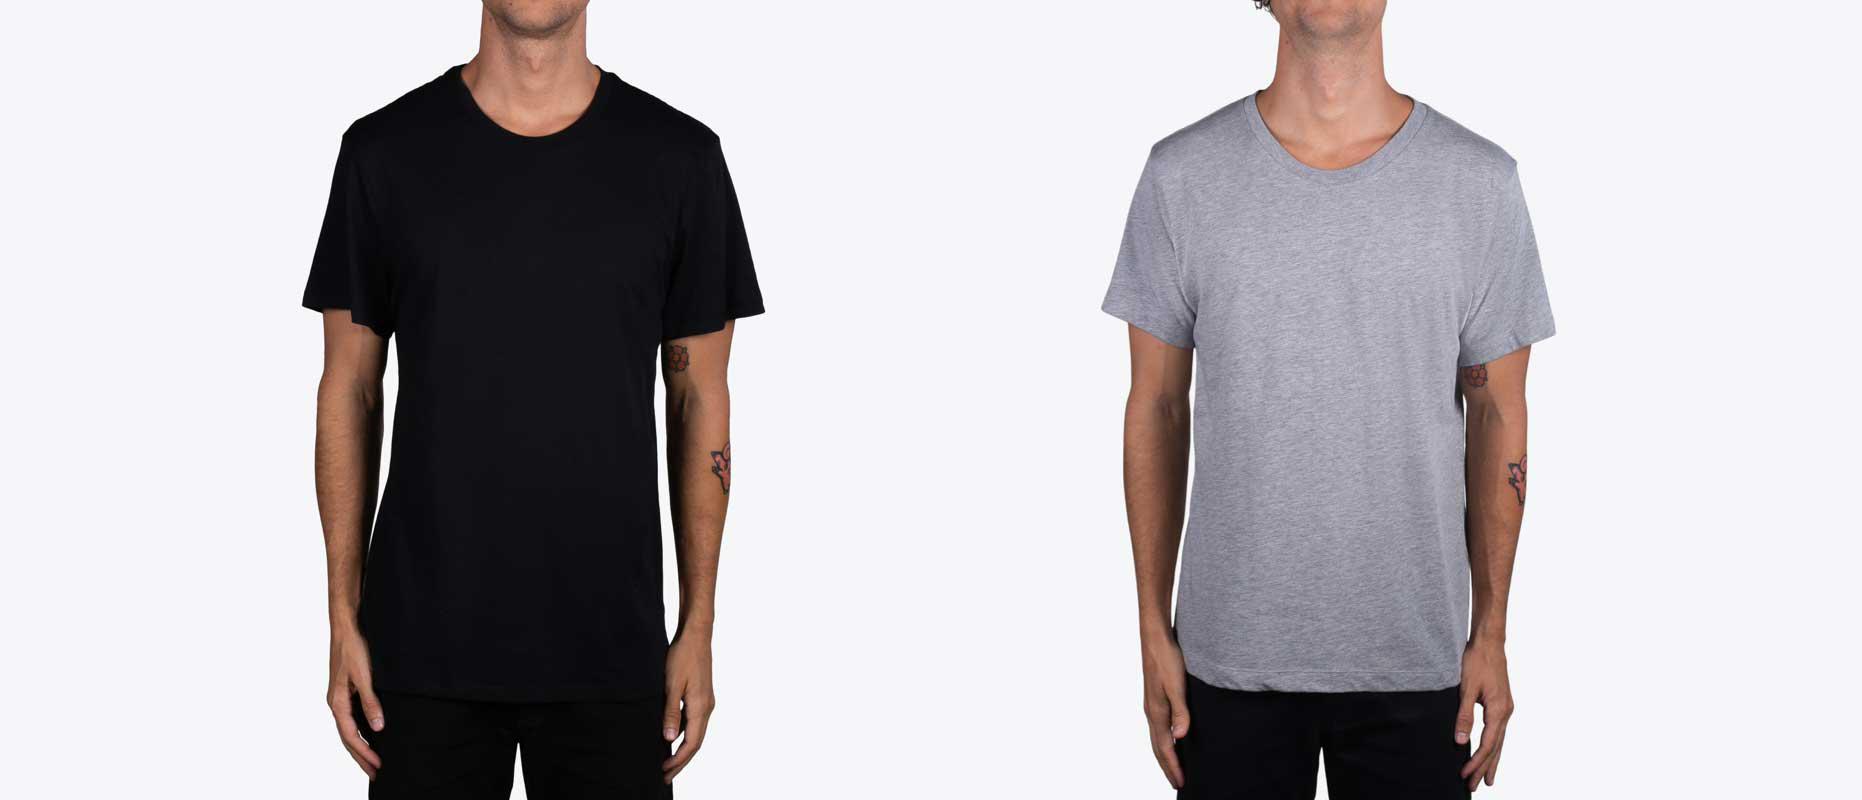 man wearing a black shirt and a gray shirt